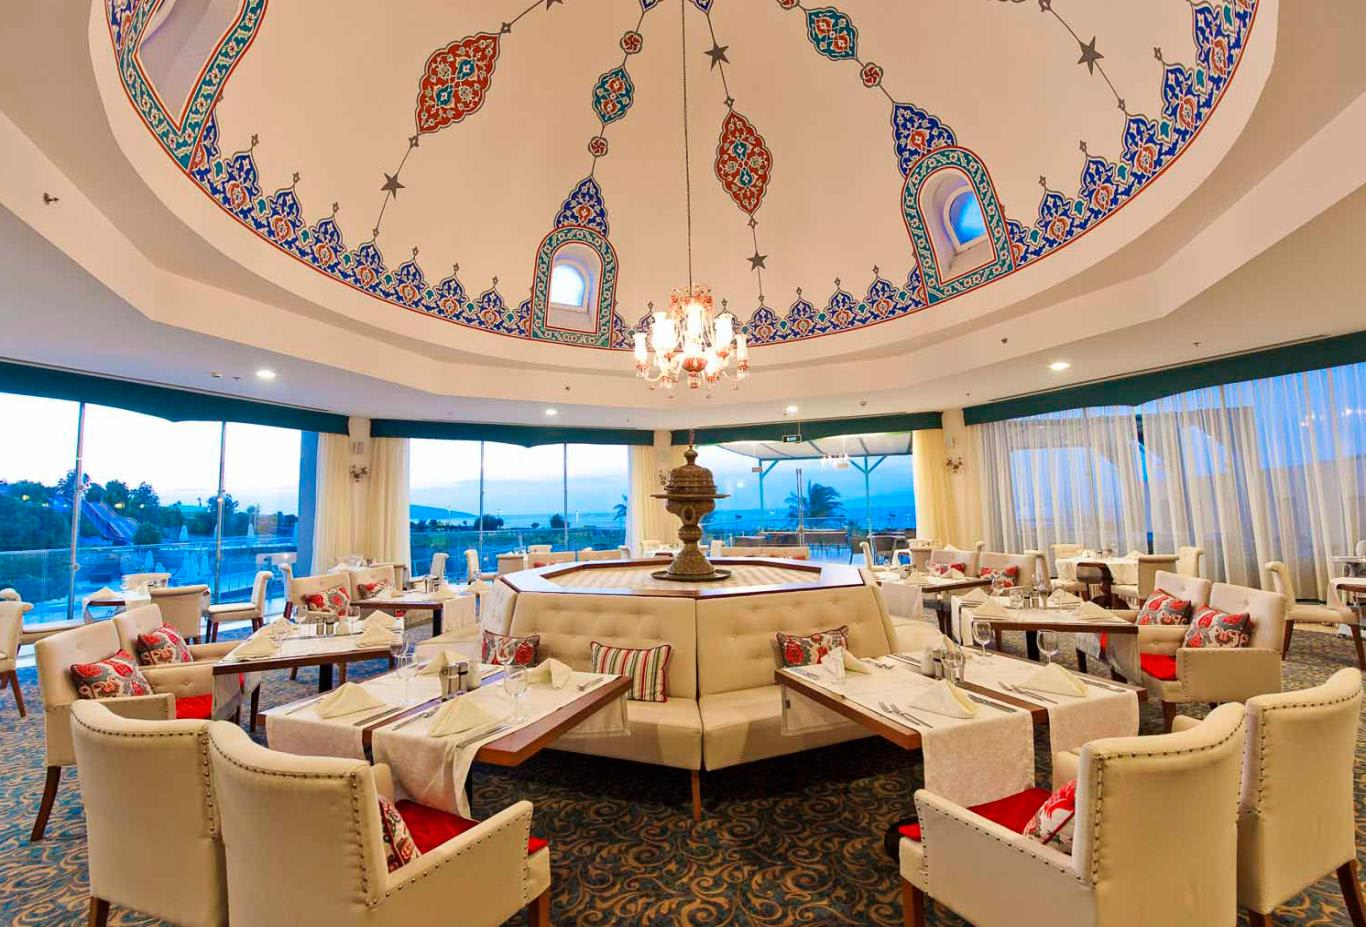 Sultan's Table